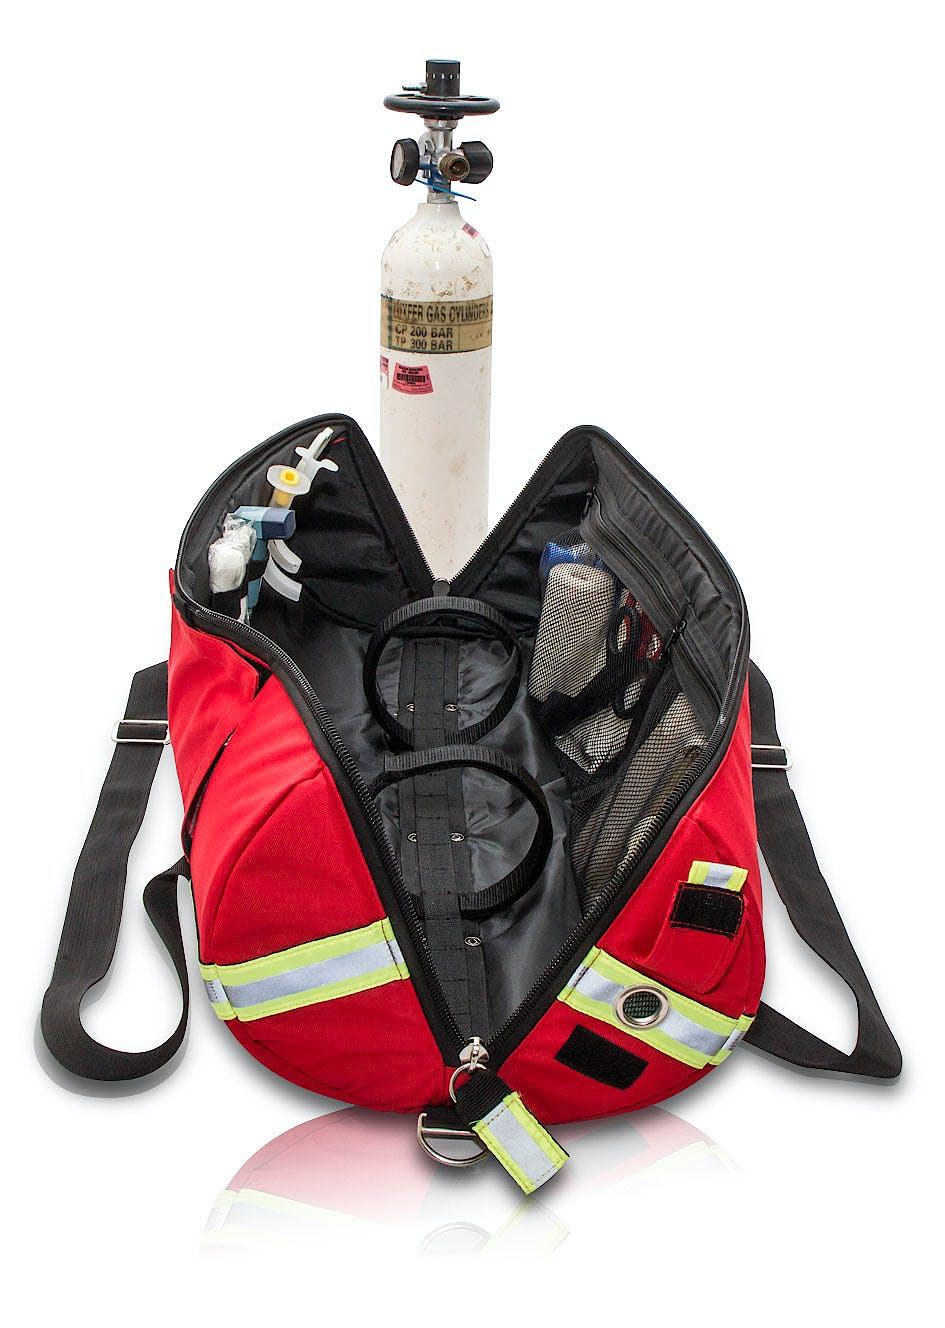 Funda para Botella Oxígeno Modelo TUBE'S EB02.016. Poliamida, Color Rojo